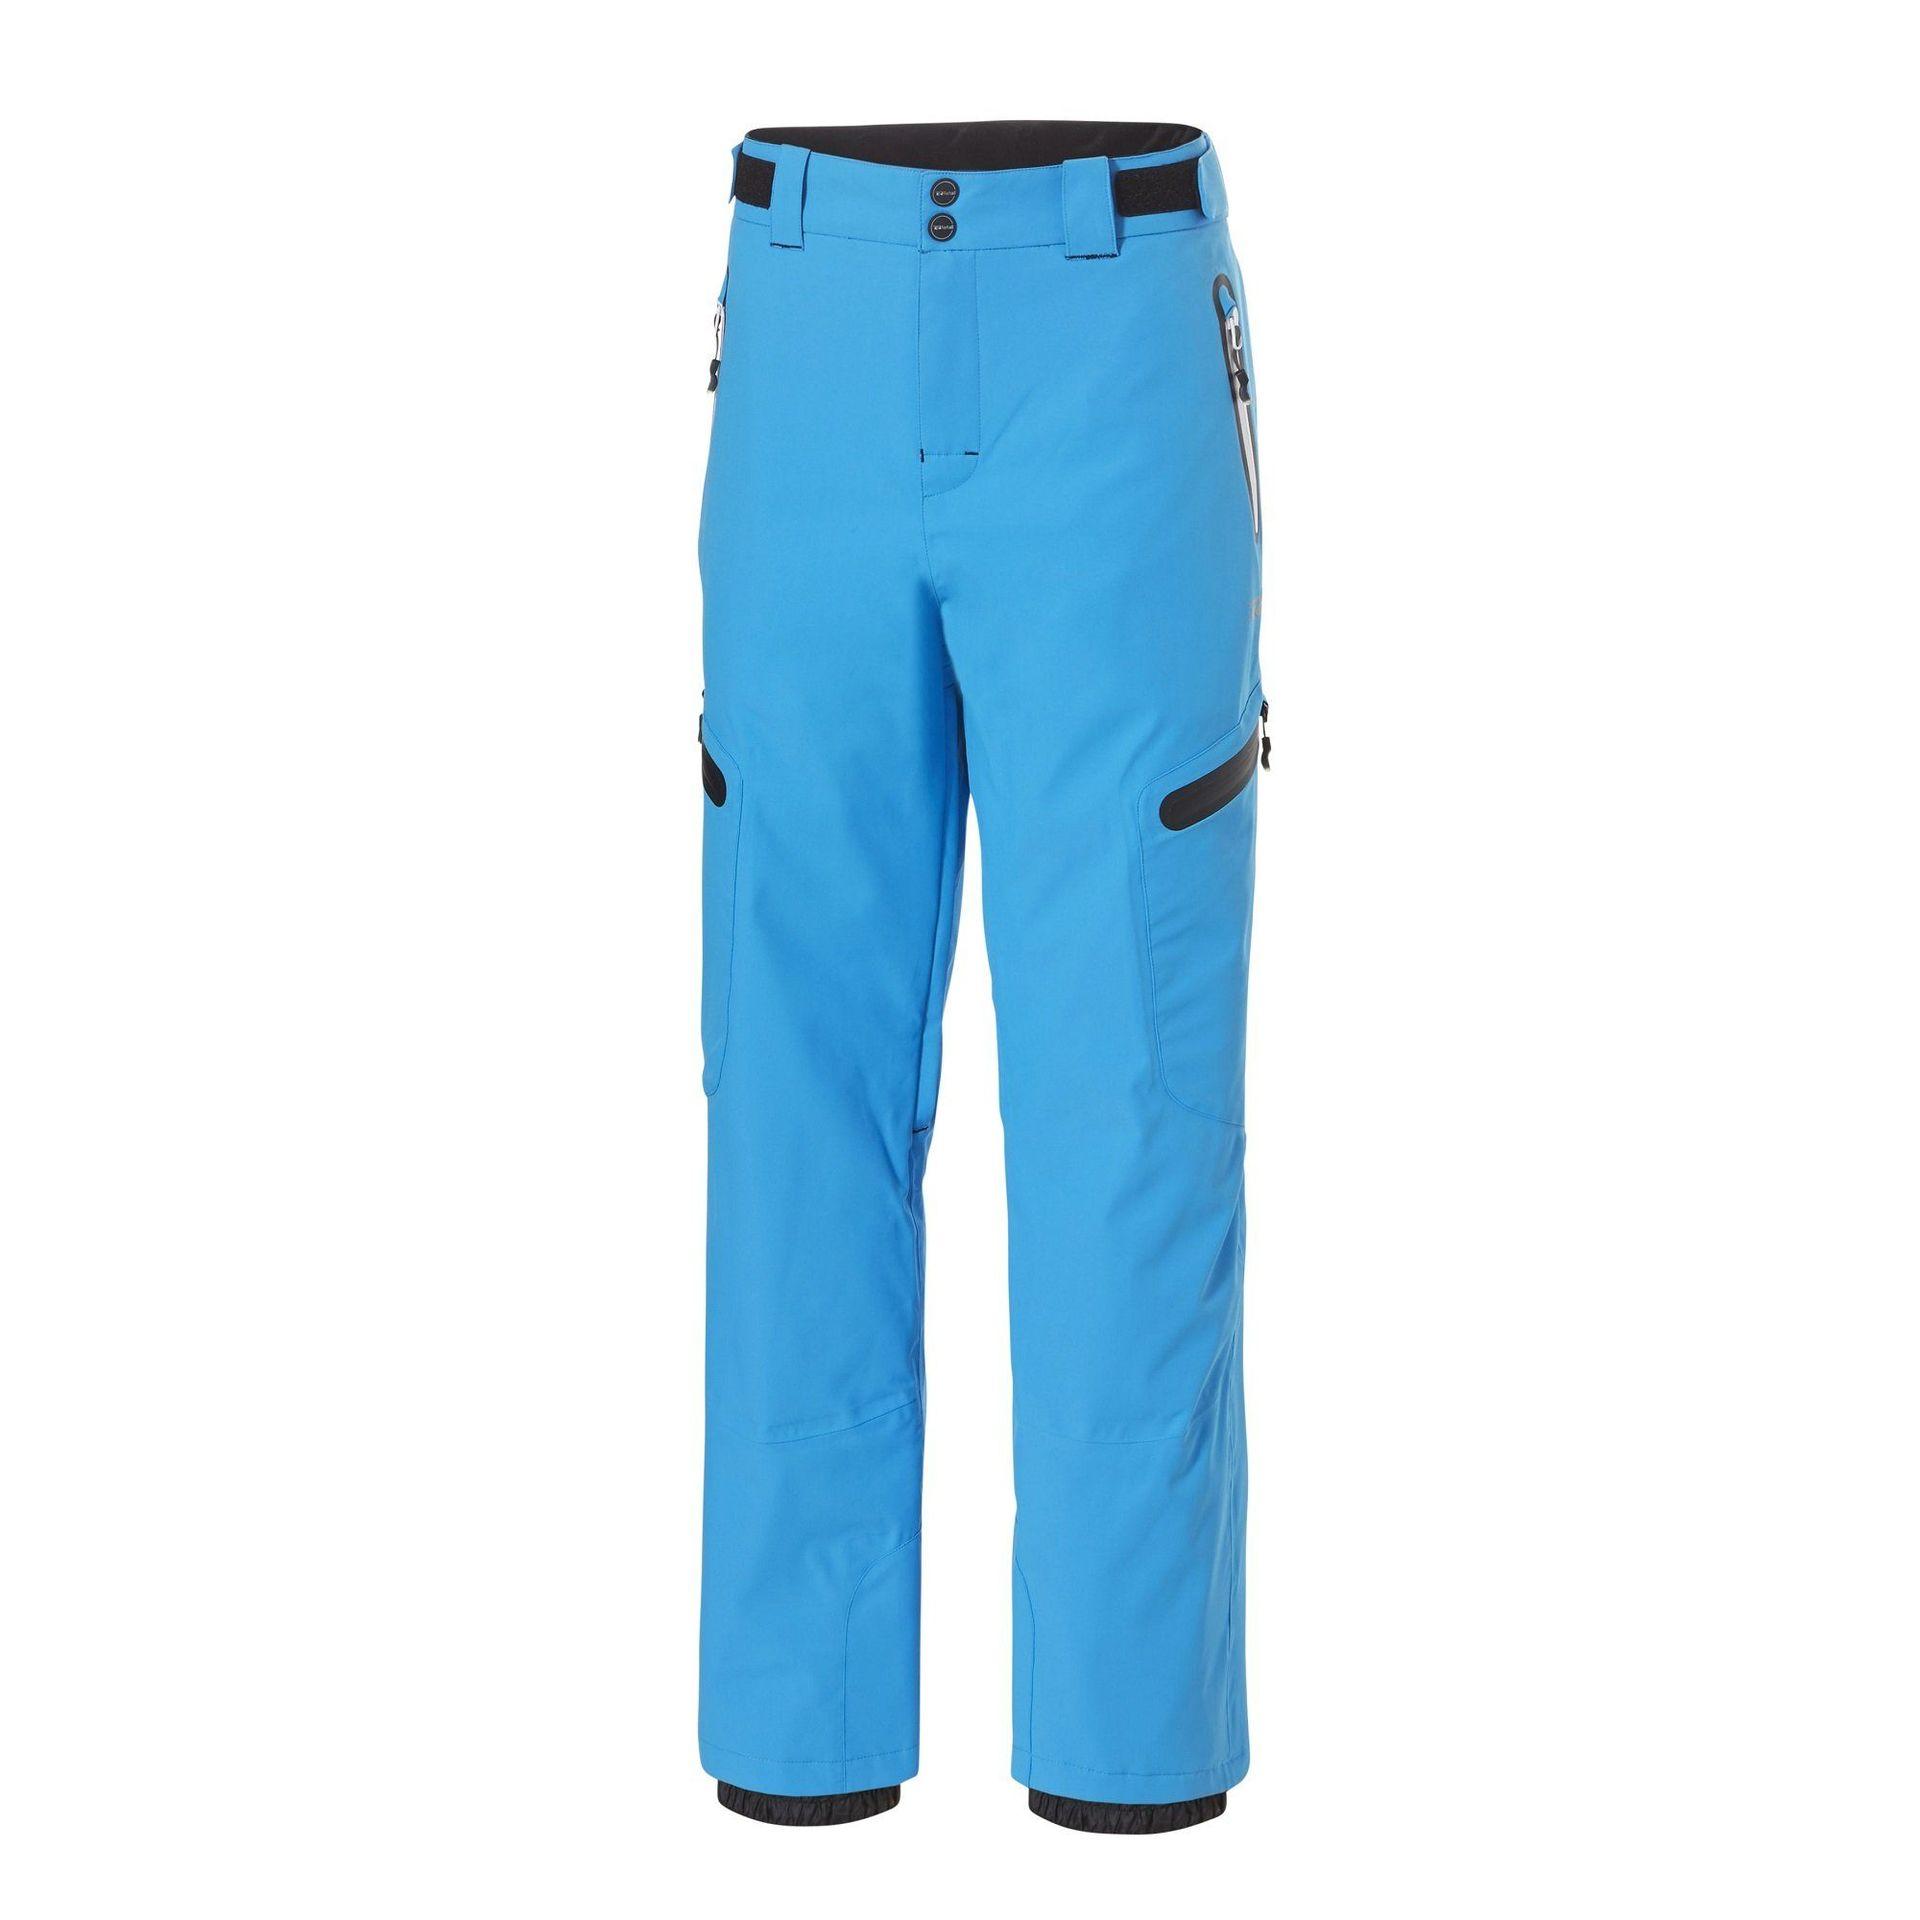 SPODNIE REHALL HIRSH-R 50667 ULTRA BLUE